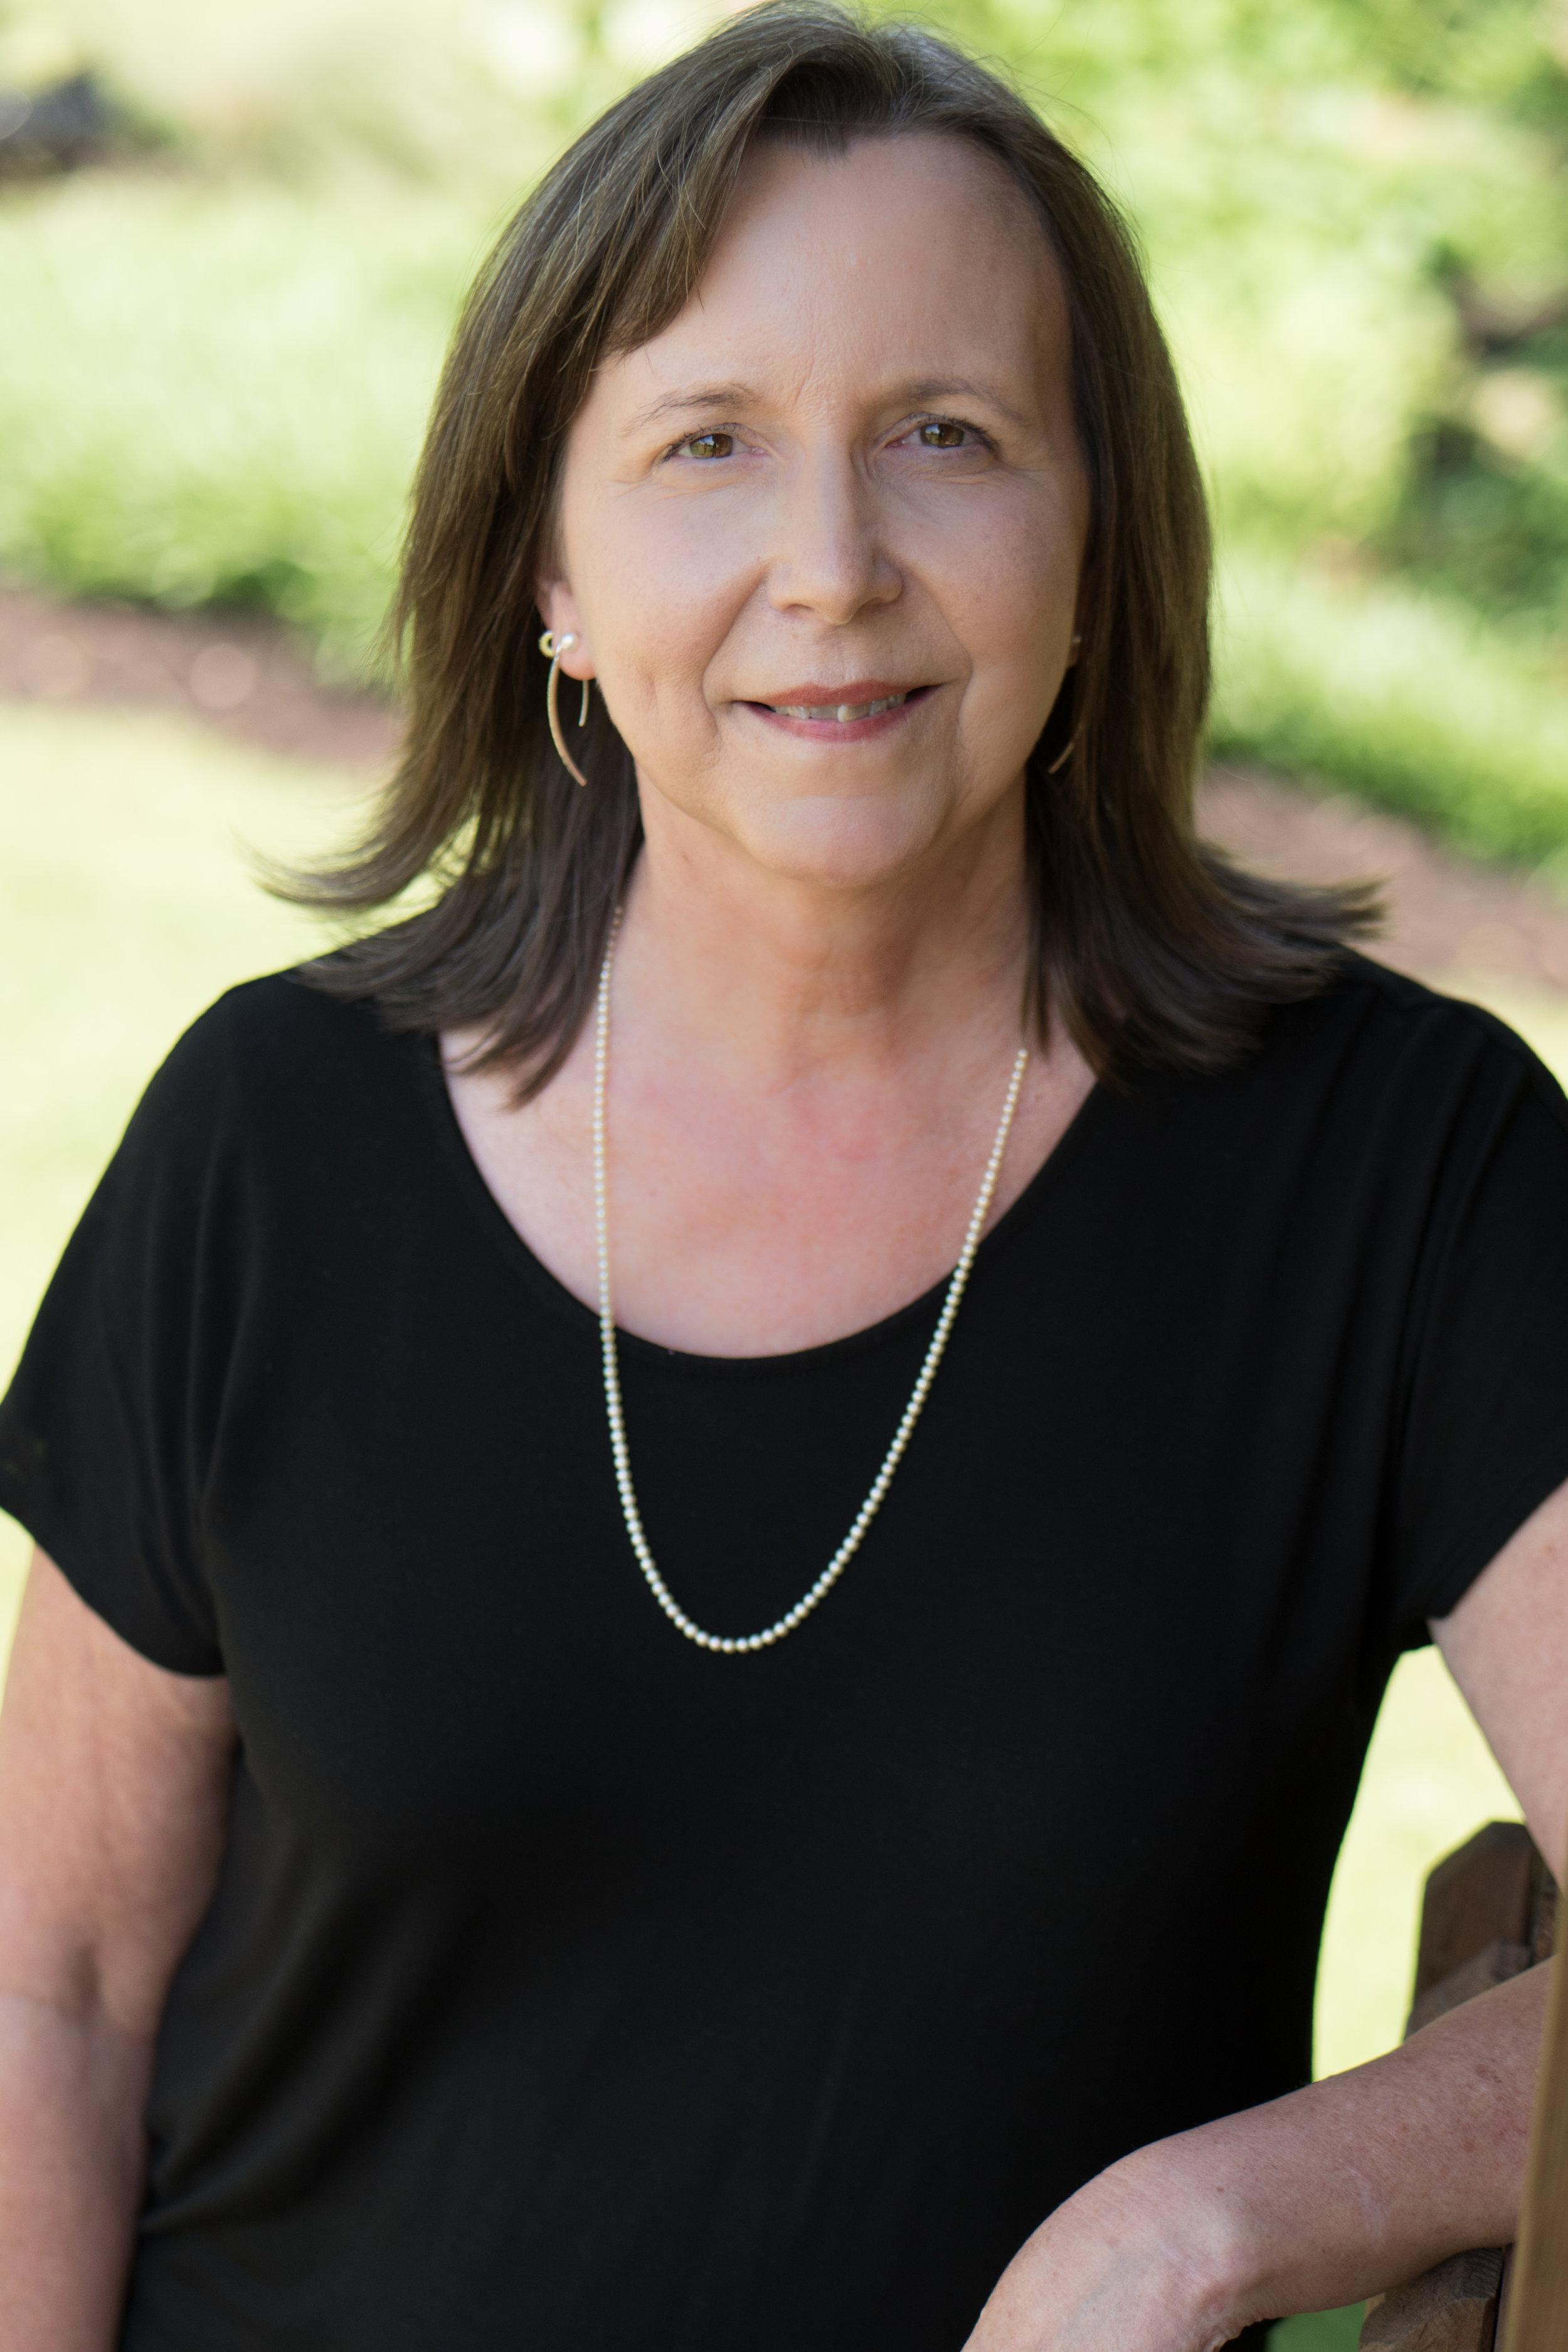 Linda Roberson